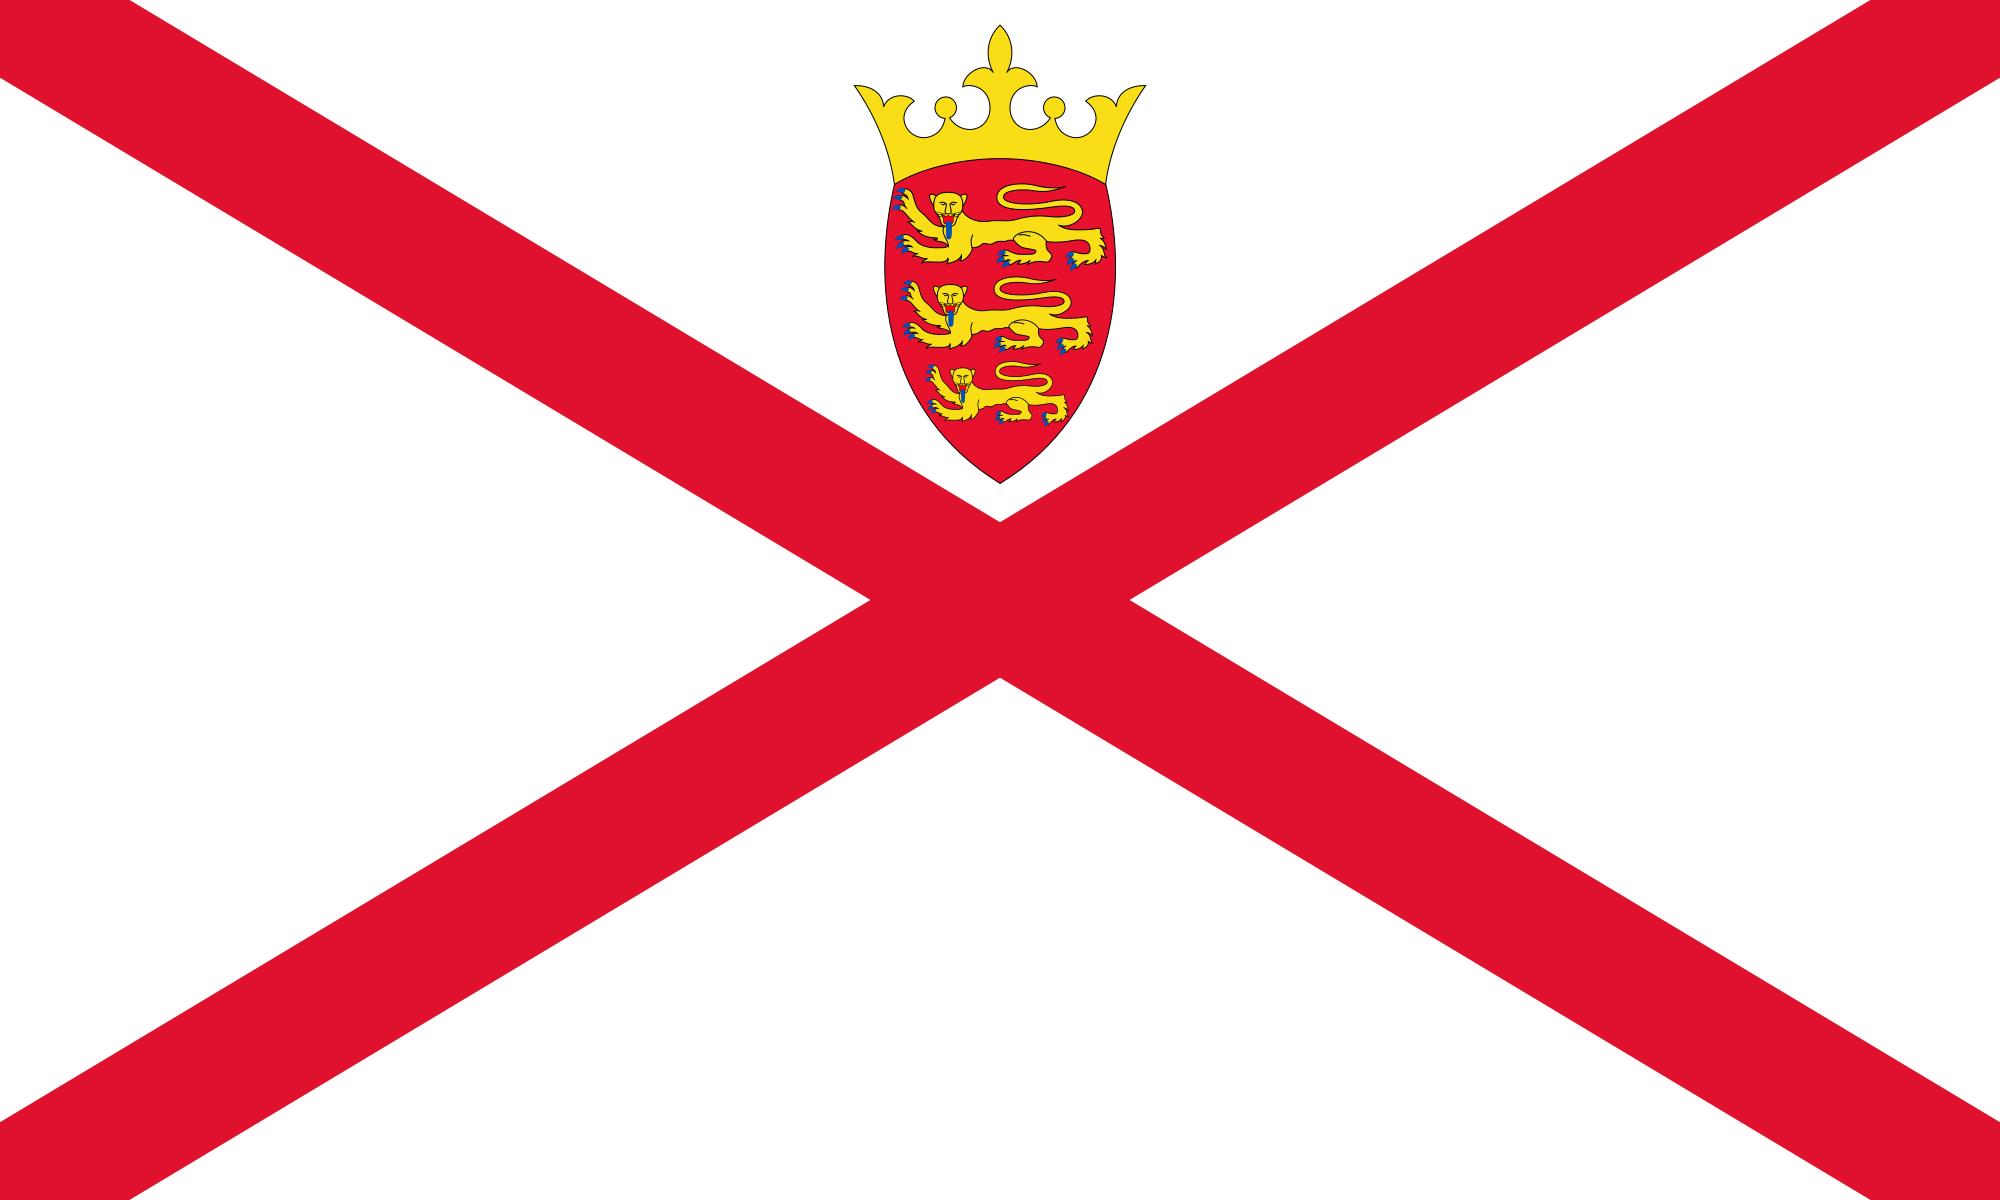 jersey, страна, Эмблема, логотип, символ - Обои HD - Профессор falken.com